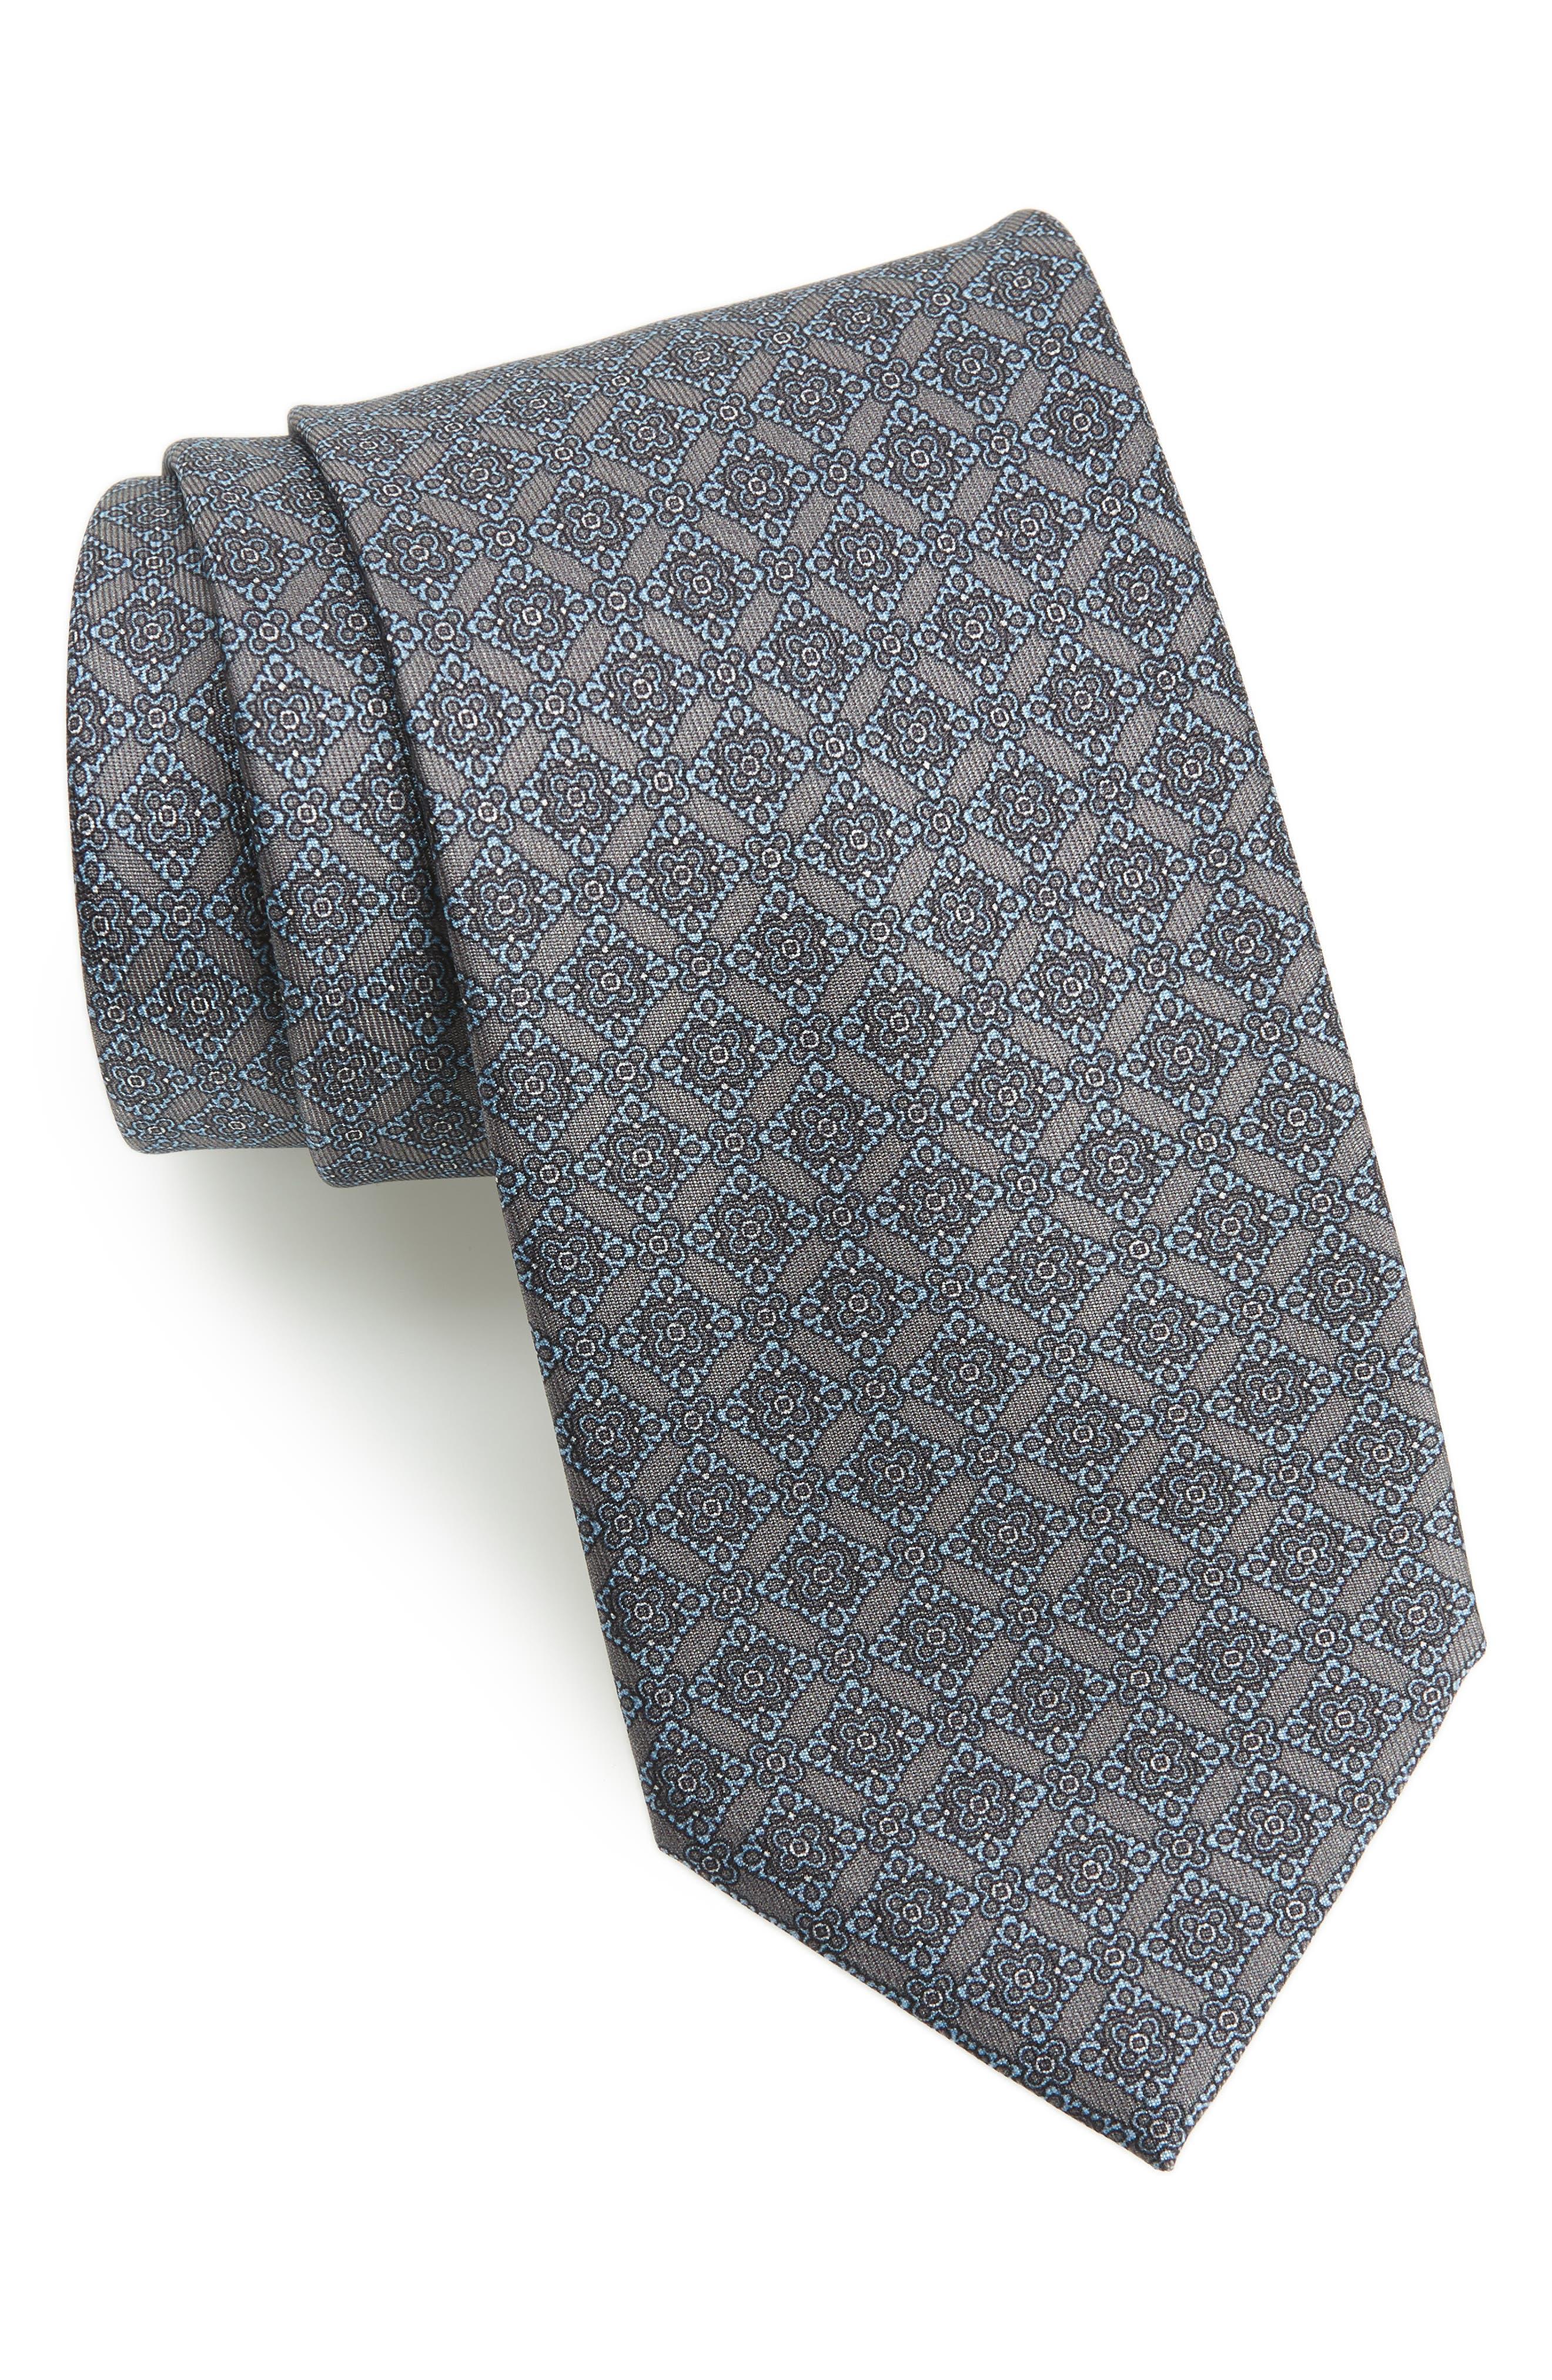 Medallion Geometric Silk Tie,                         Main,                         color, GREY/ TURQUOISE